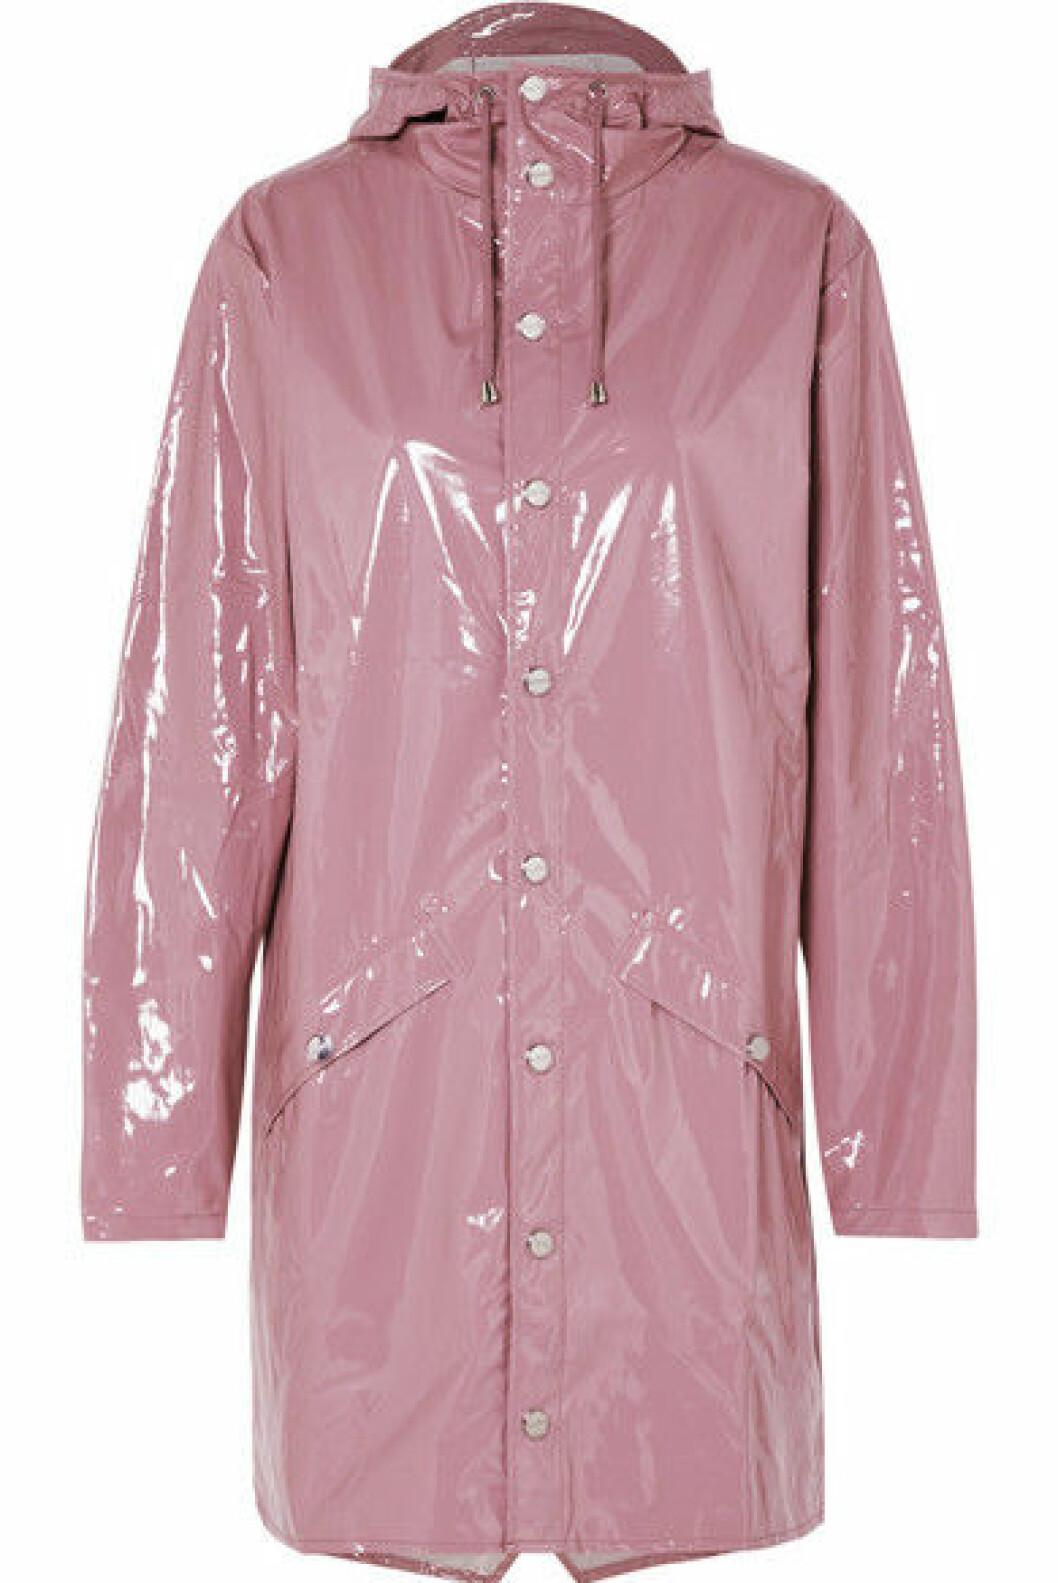 Regnjakke fra Rains  1500,-  https://www.net-a-porter.com/no/en/product/1089856/rains/hooded-glossed-pu-raincoat